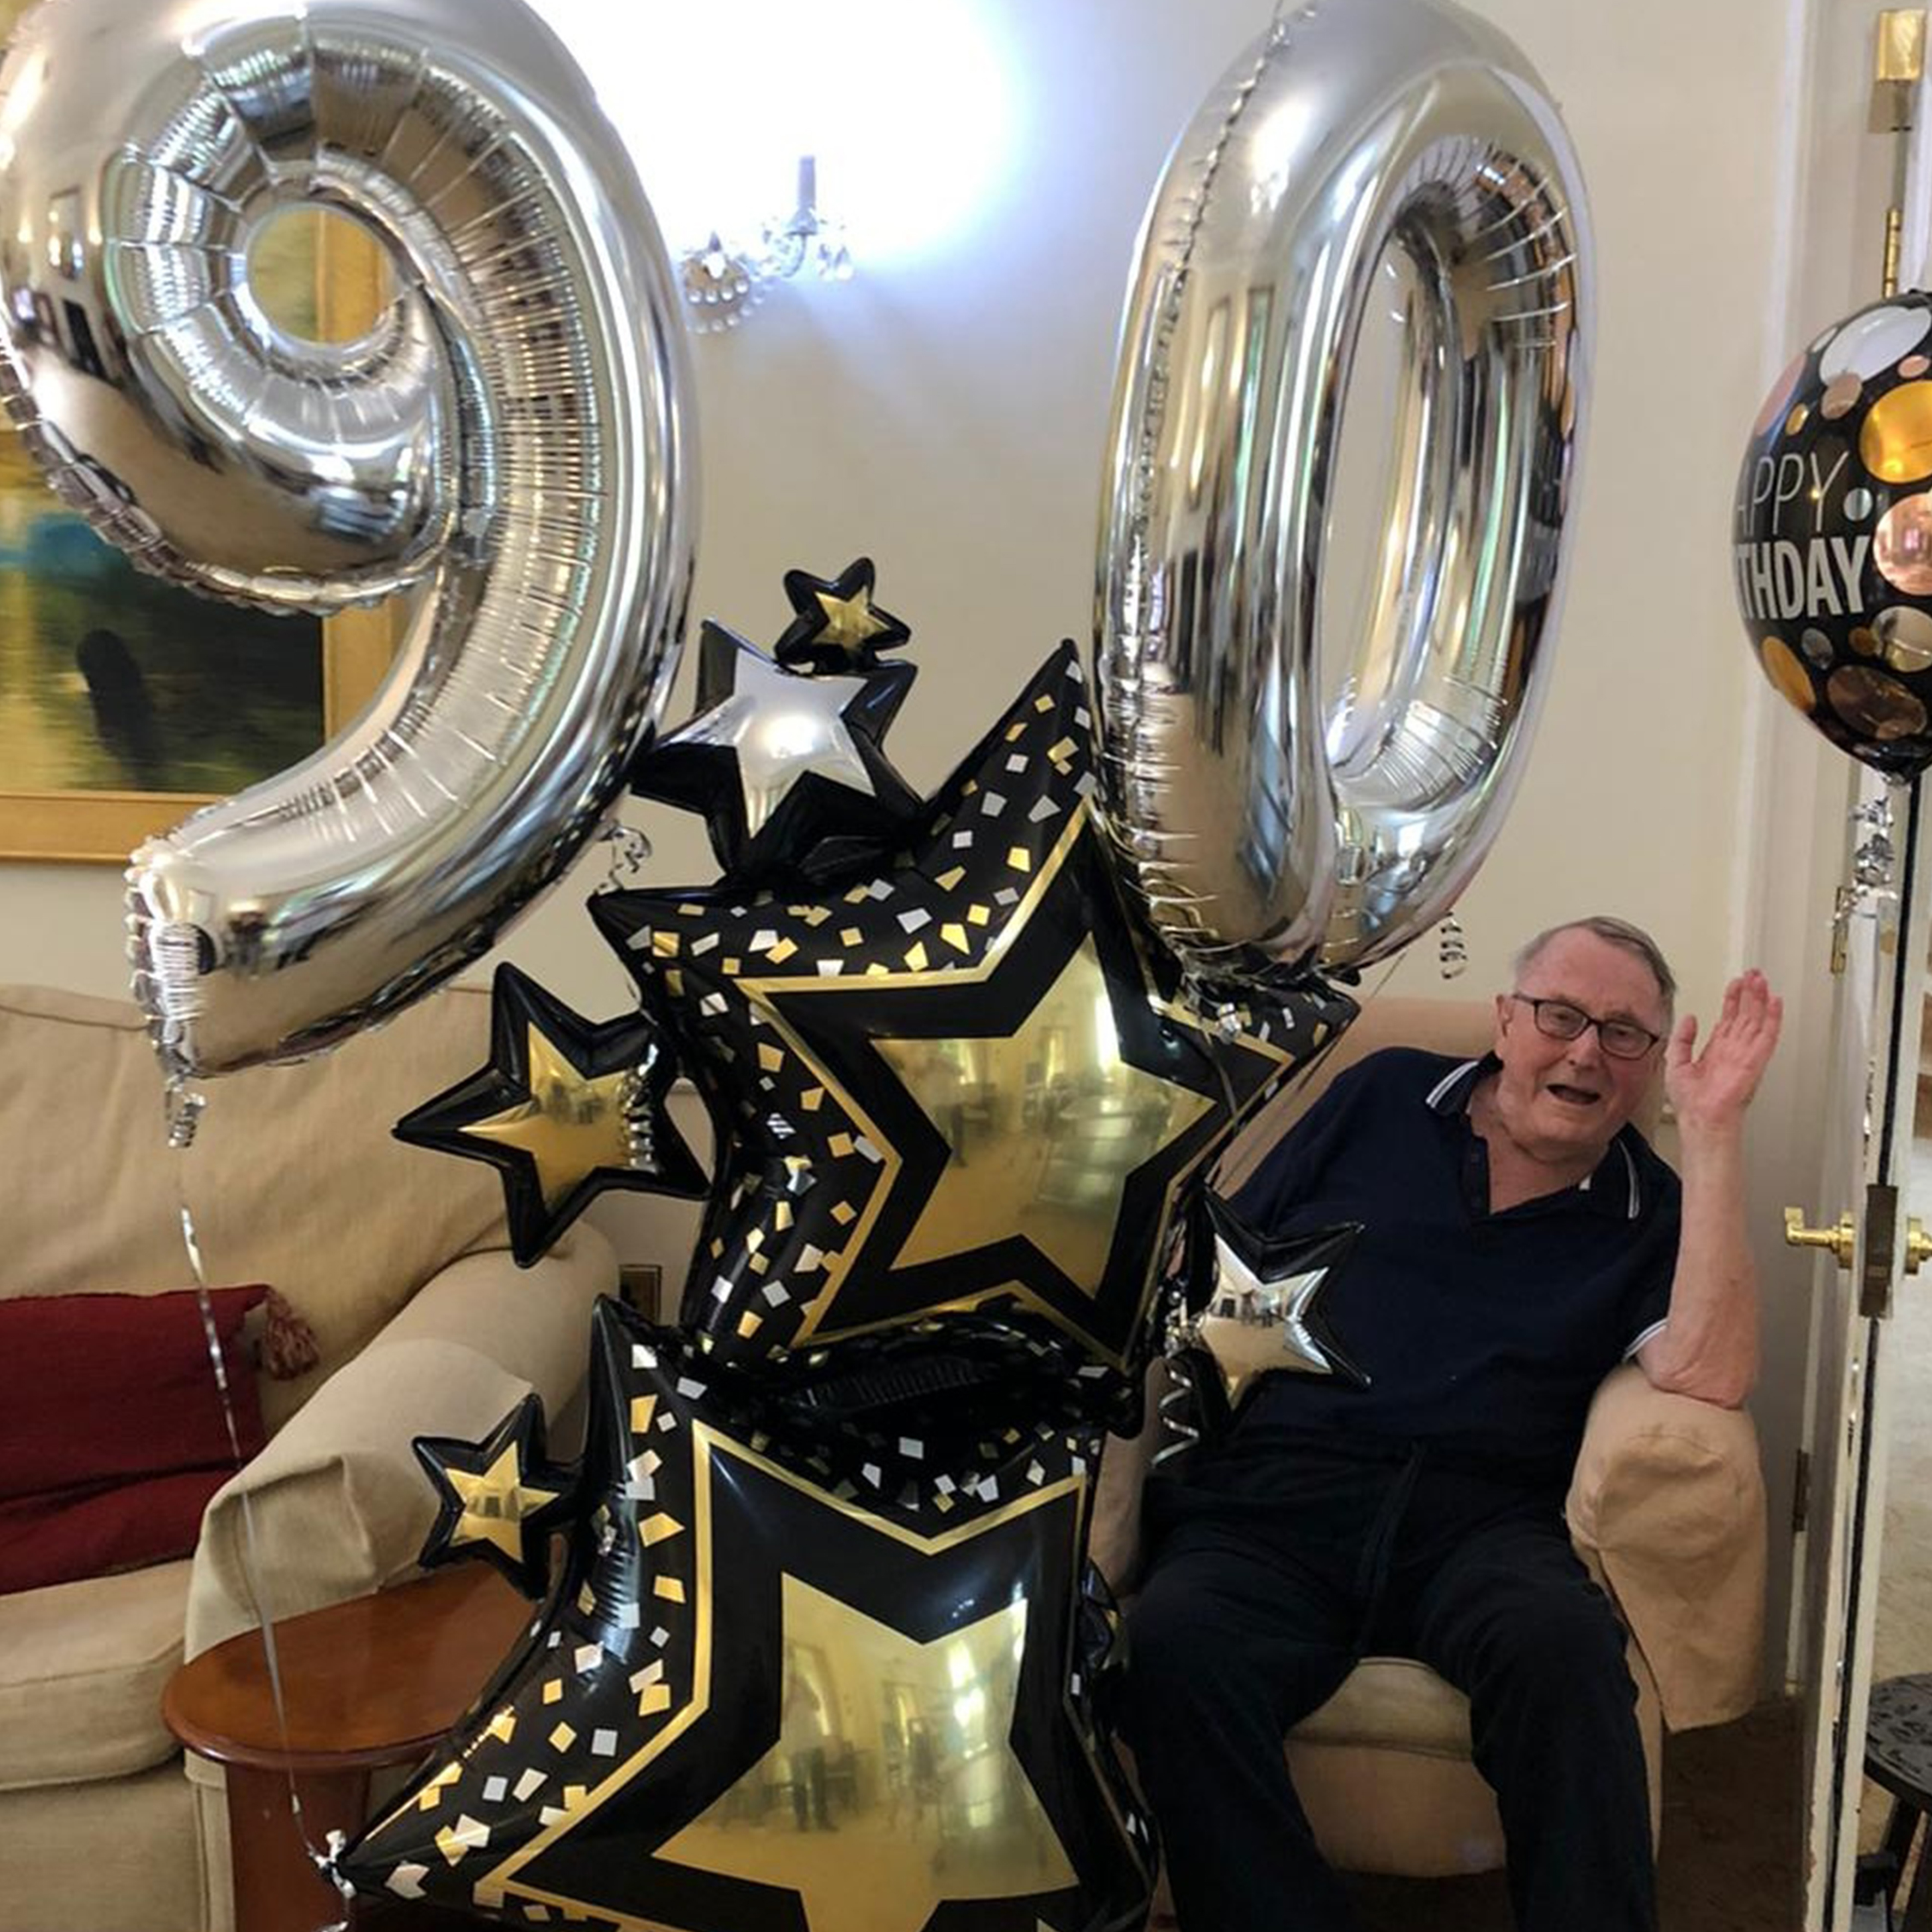 John's 90th birthday